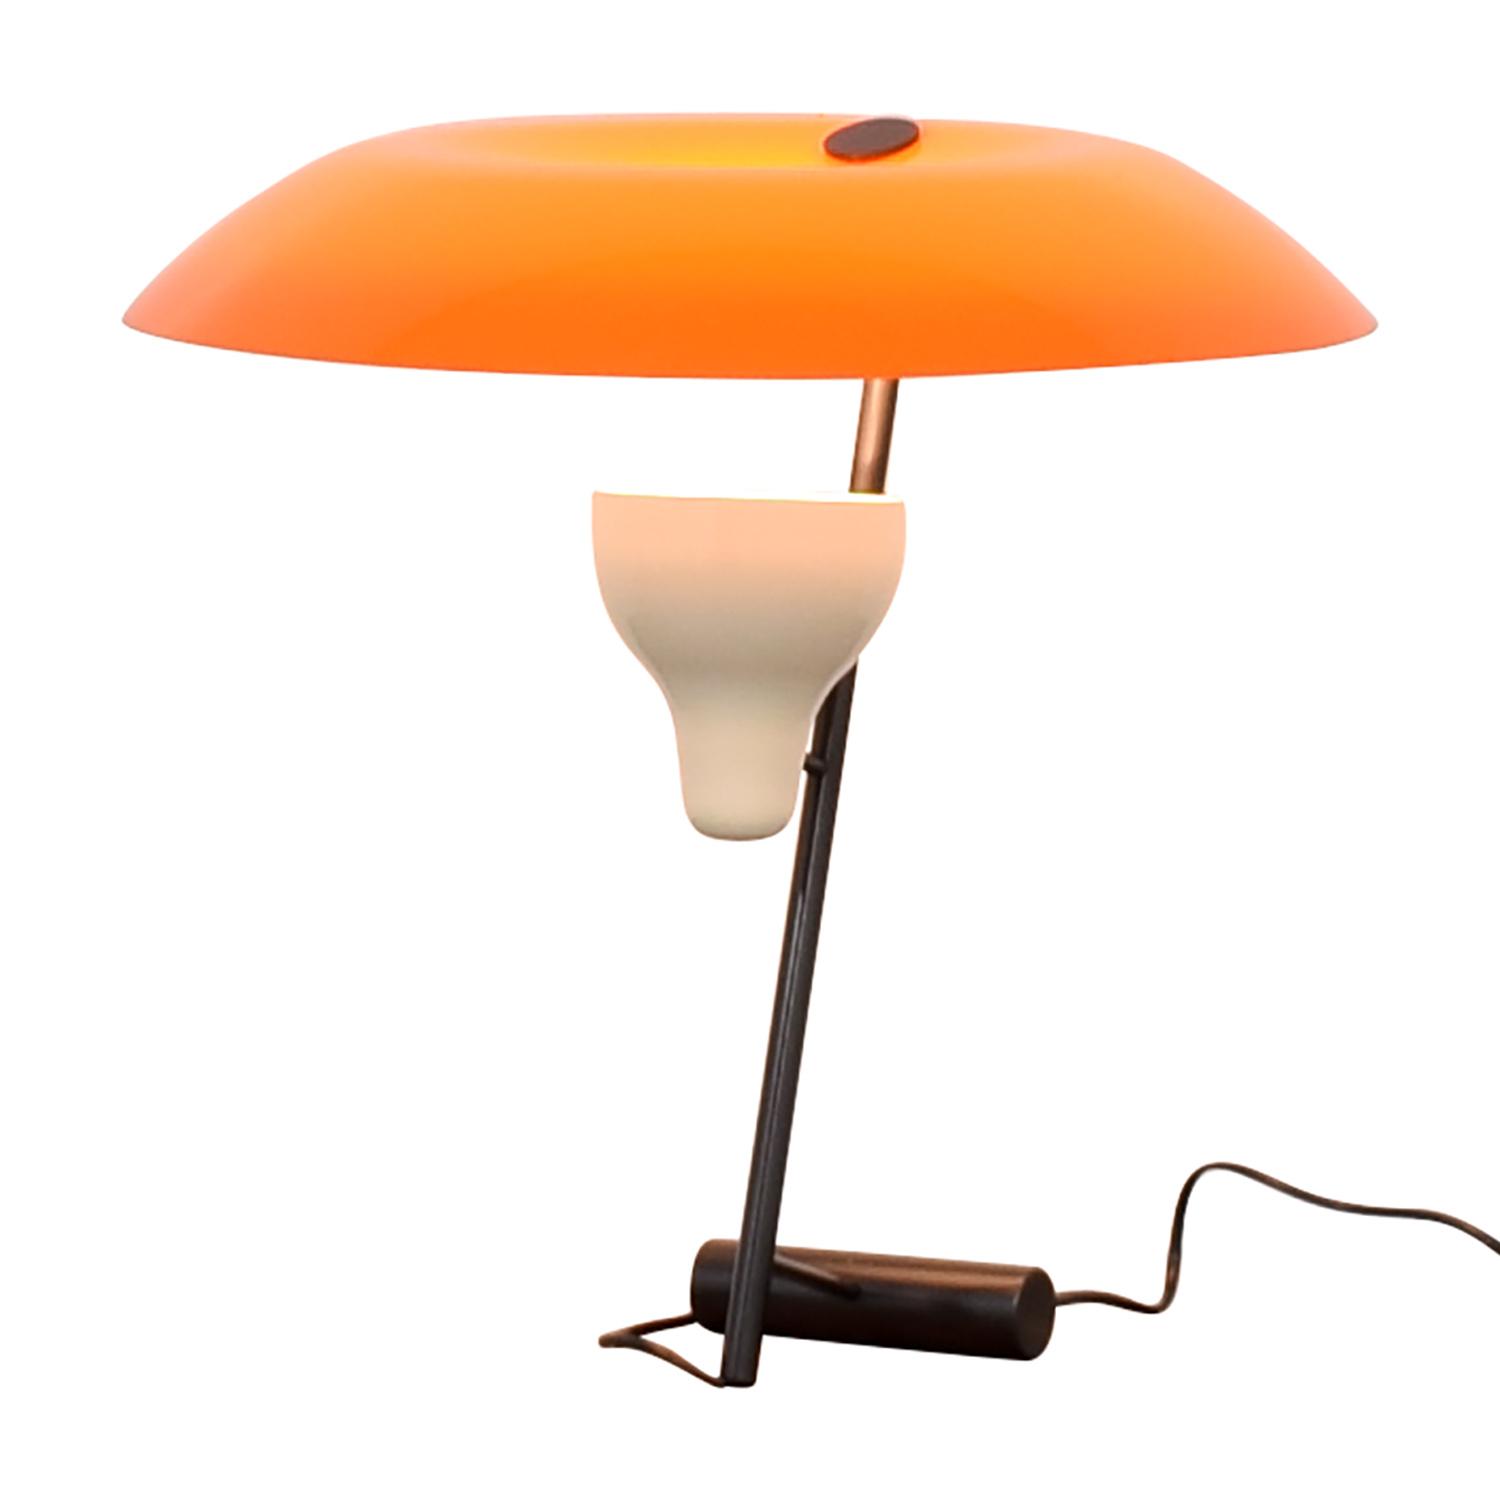 buy FLOS Gino Sarfatti Orange and Burnished Brass Table Lamp FLOS Decor